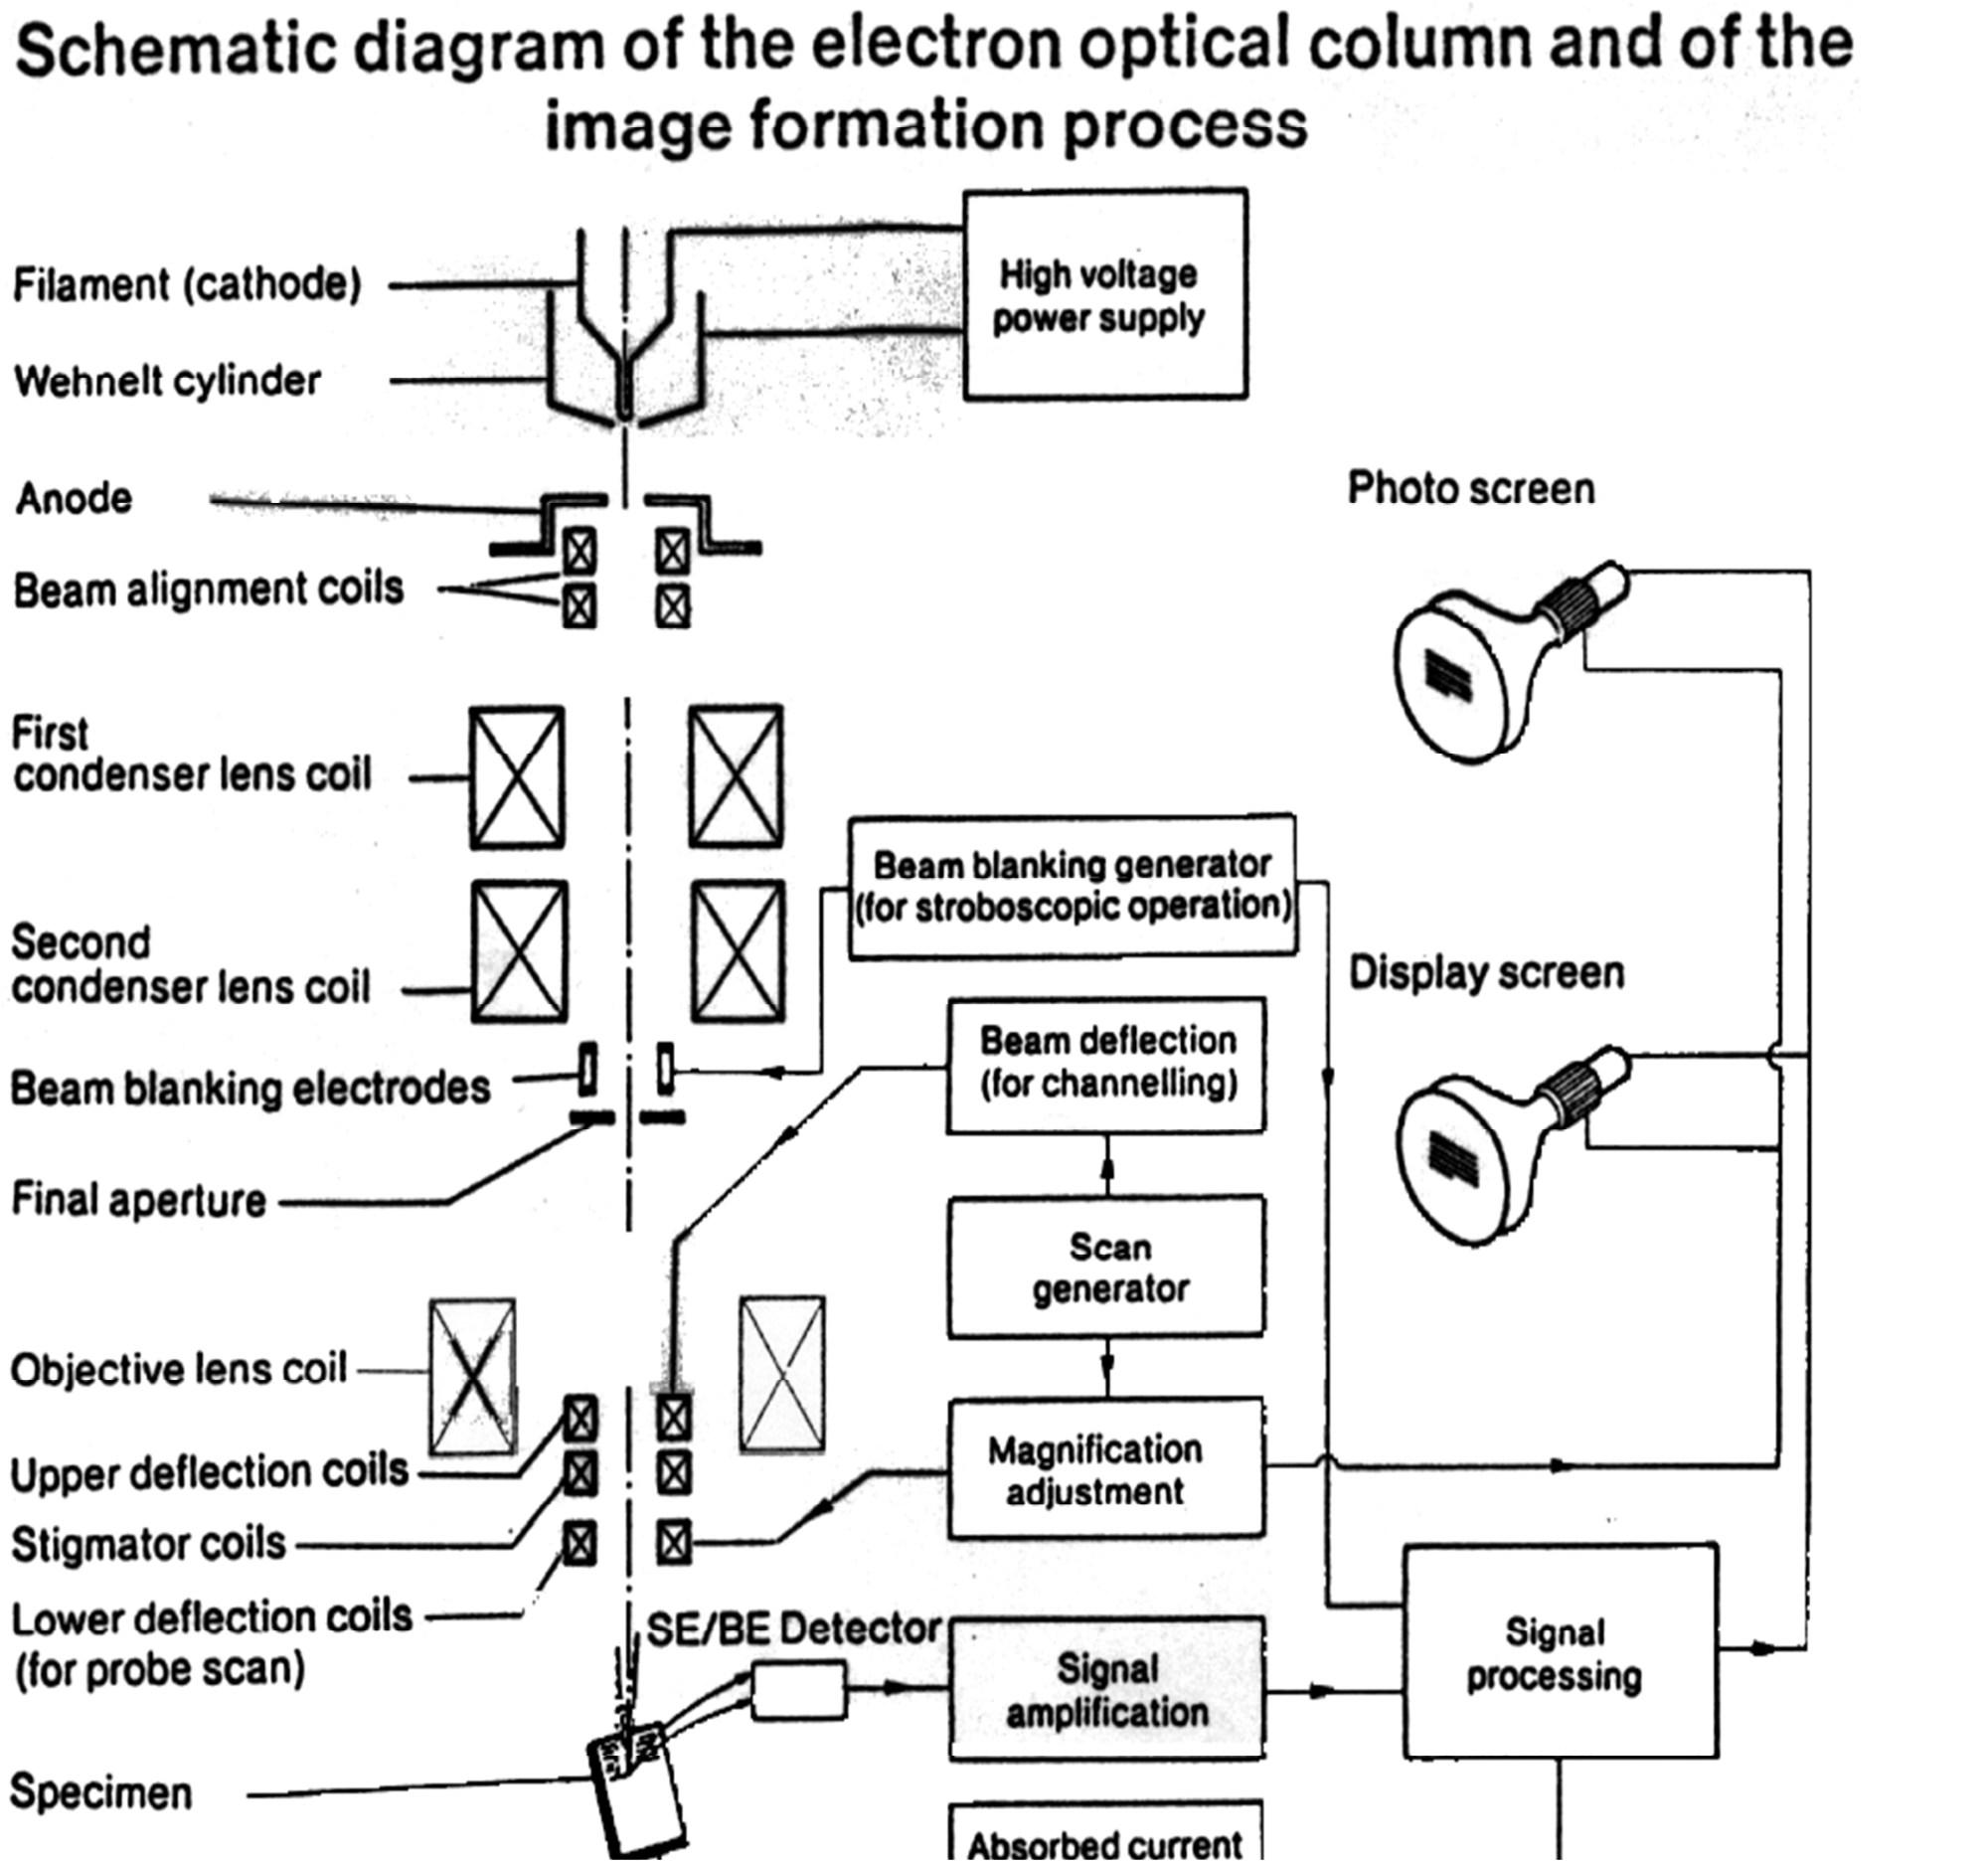 hight resolution of electron optical column